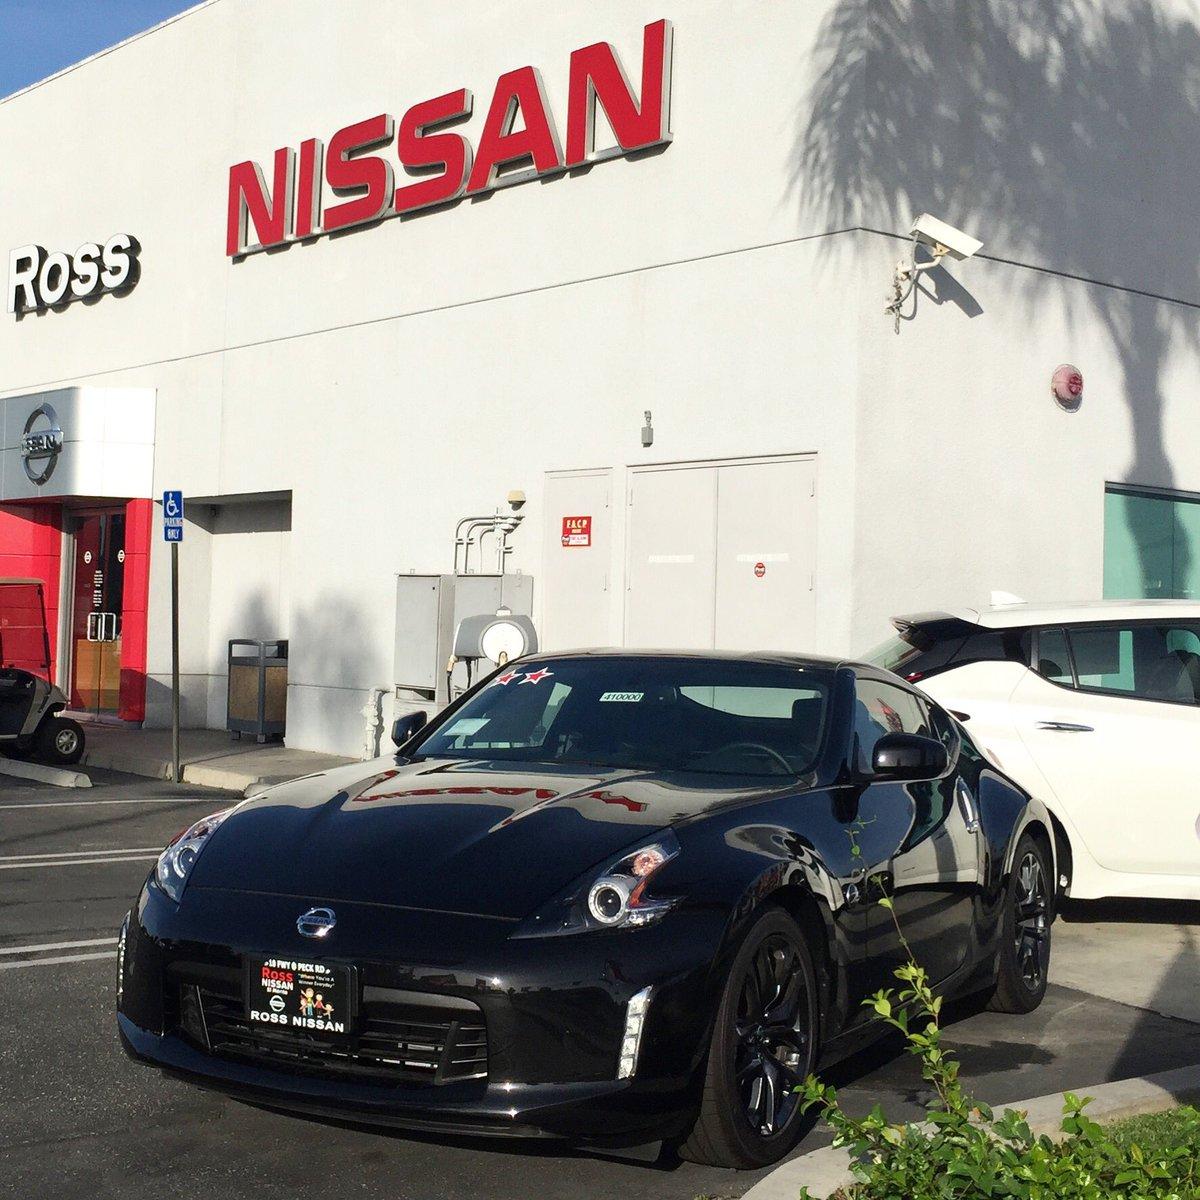 Visit Ross Nissan Of El Monte For A Closer Look.  #z34pic.twitter.com/XaqSIOQbFi